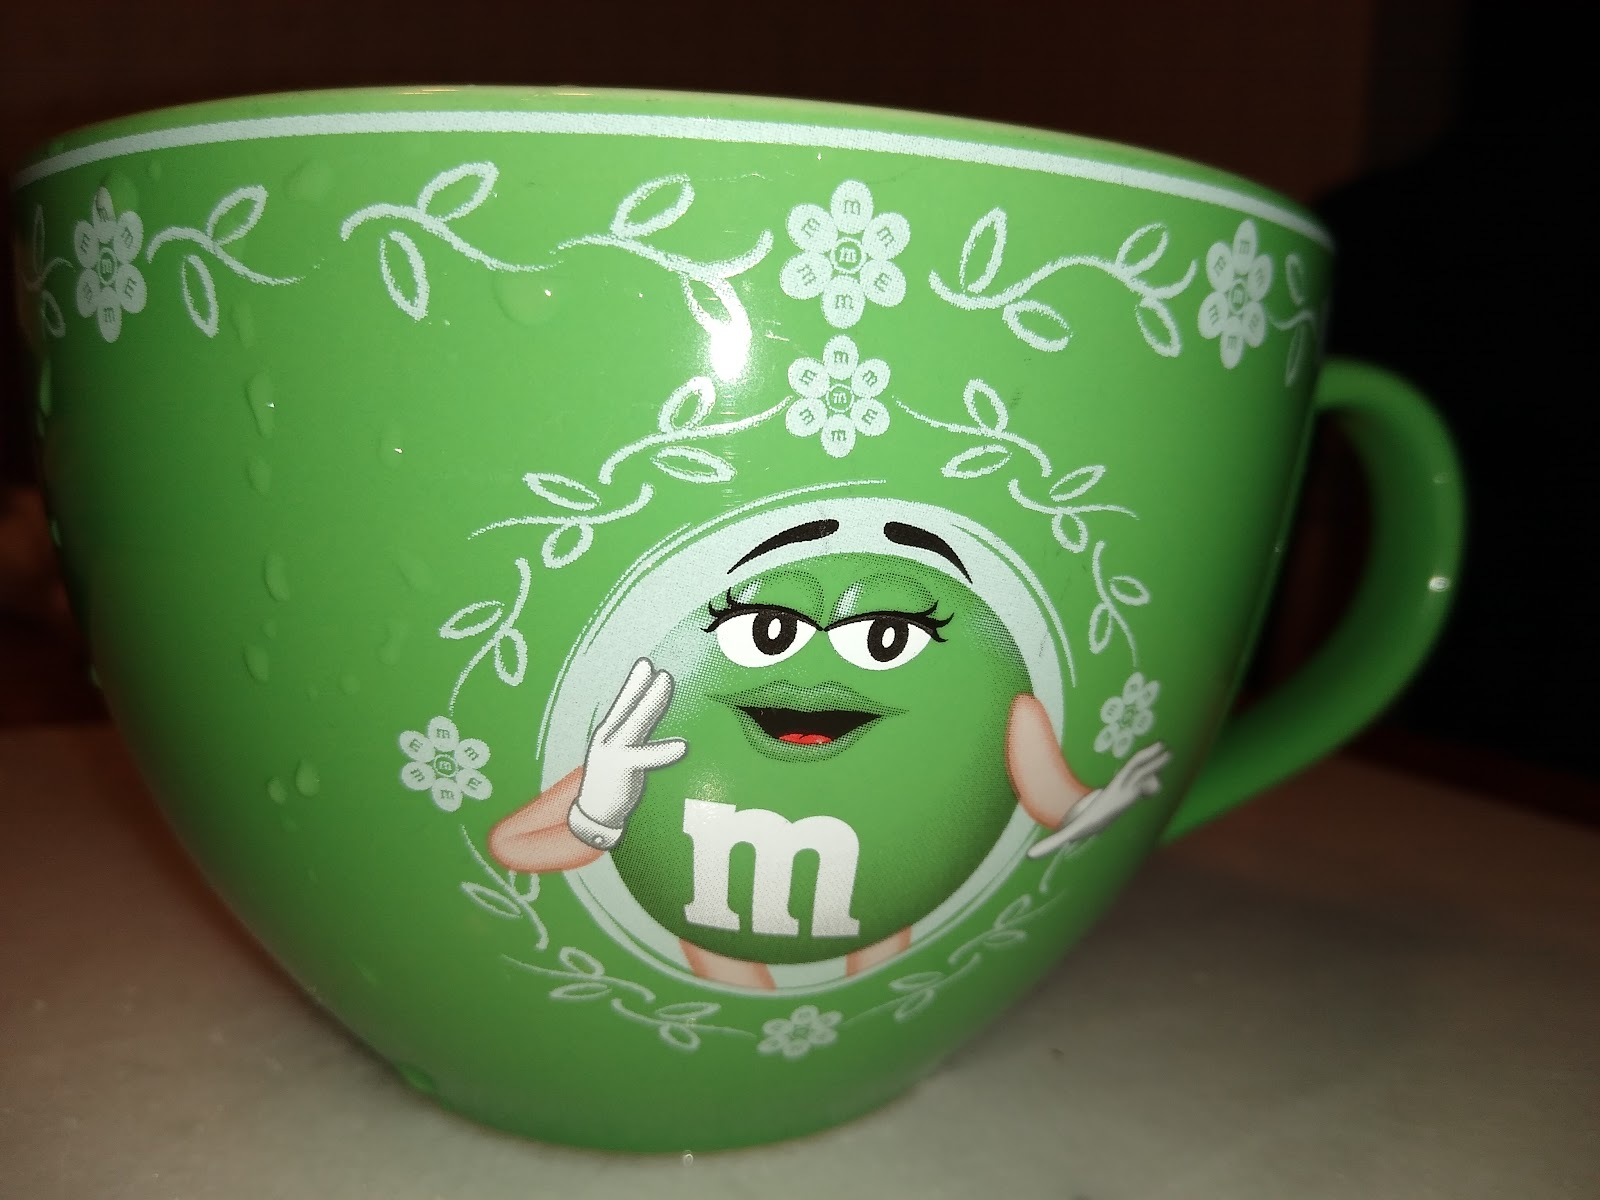 m&m coffee mug picture